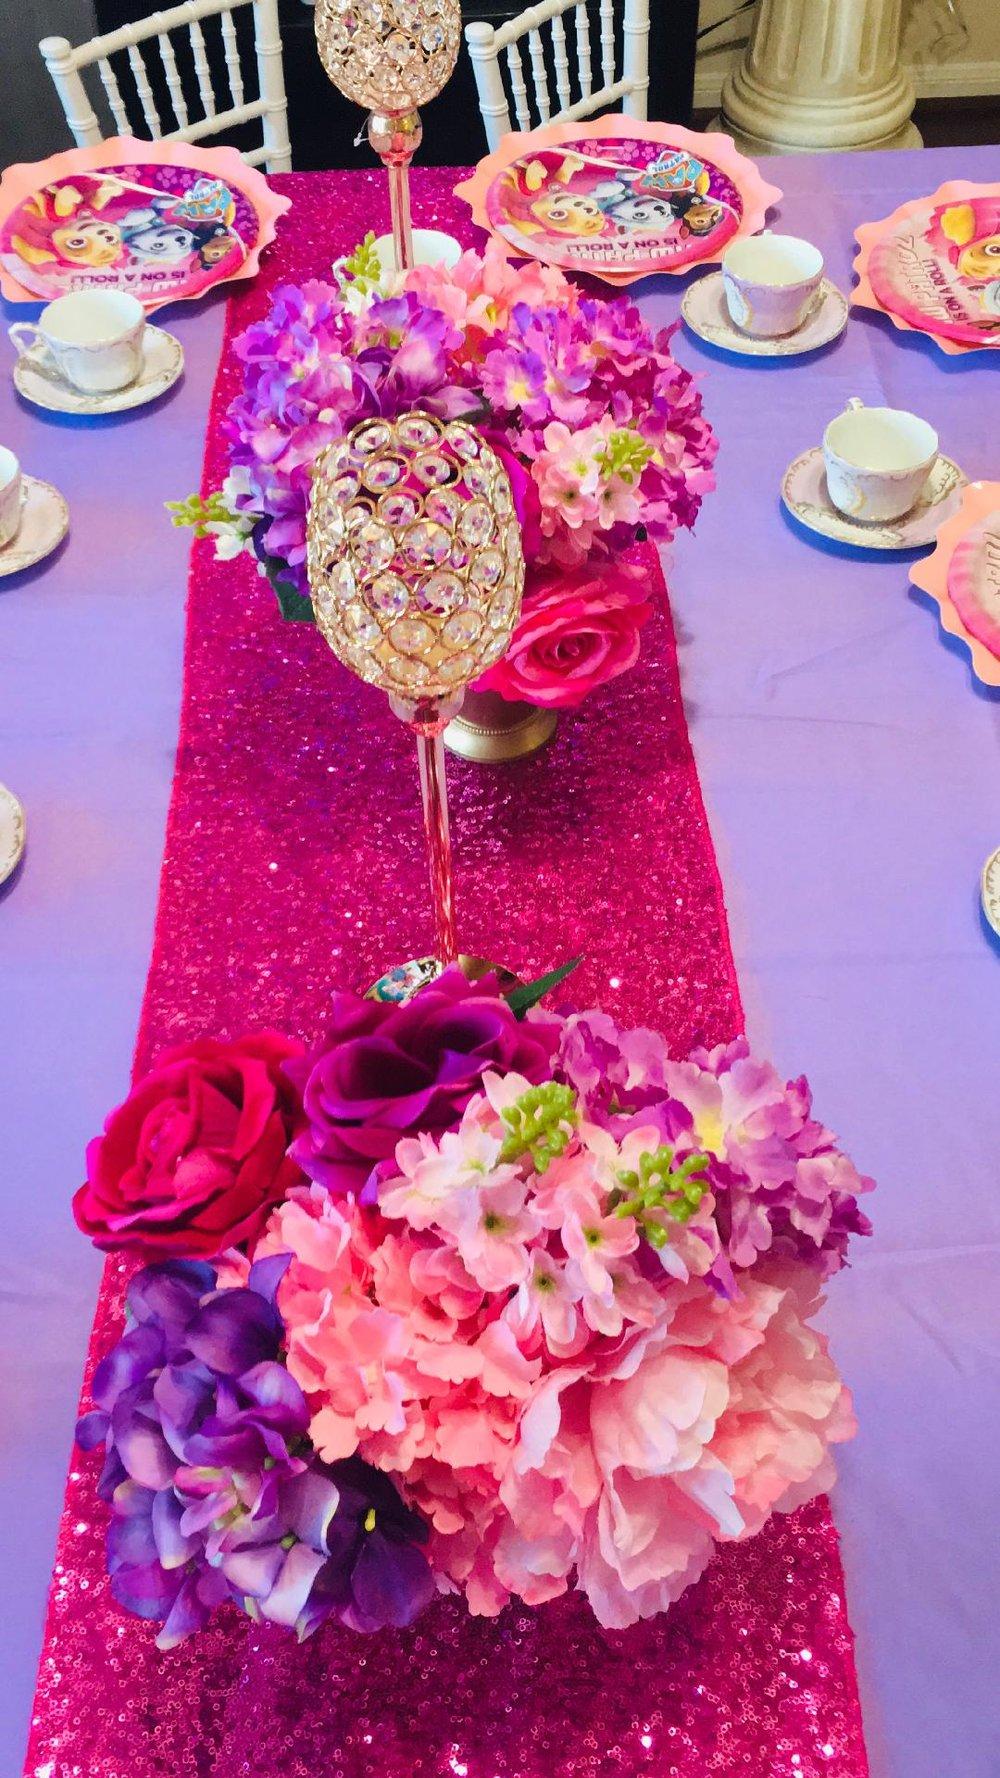 pawpatrol party houston www.tlparties.com 4.jpg